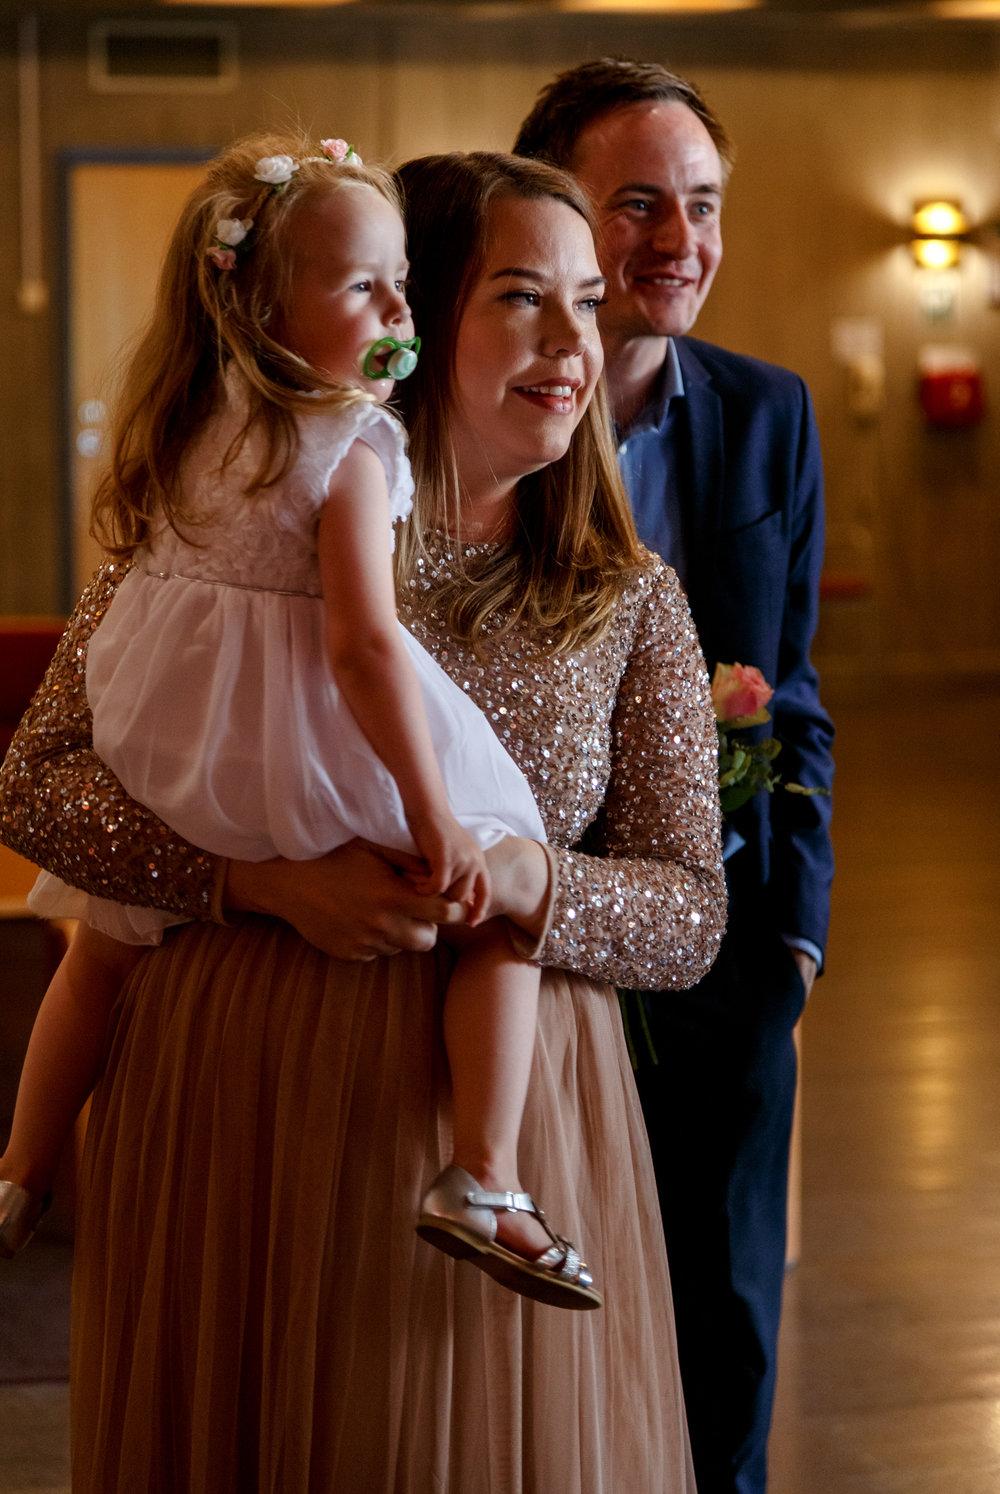 20180519-bröllop-fanny-daniel-201-2.jpg